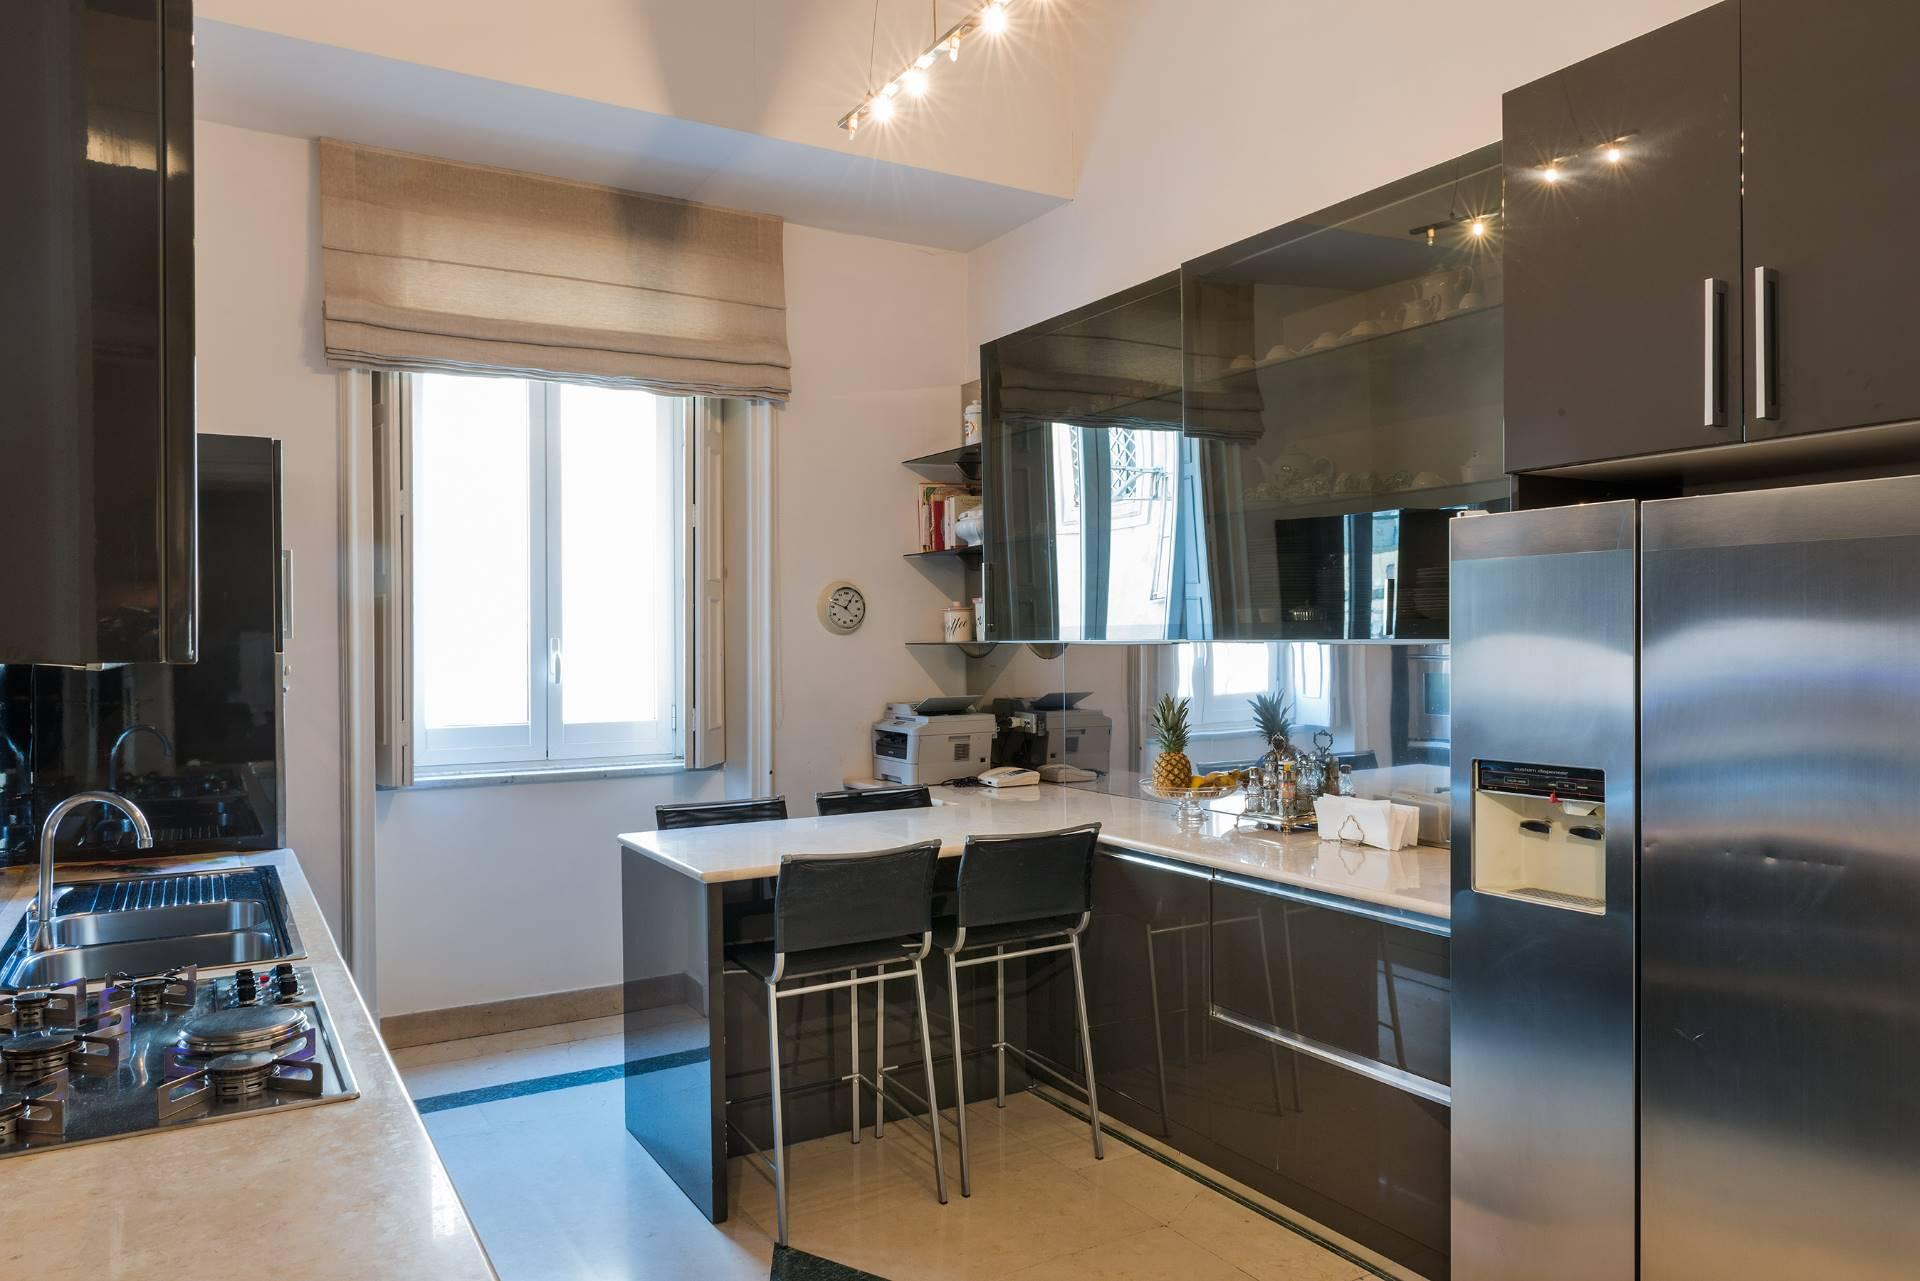 Stylish apartment with seaviews - 15